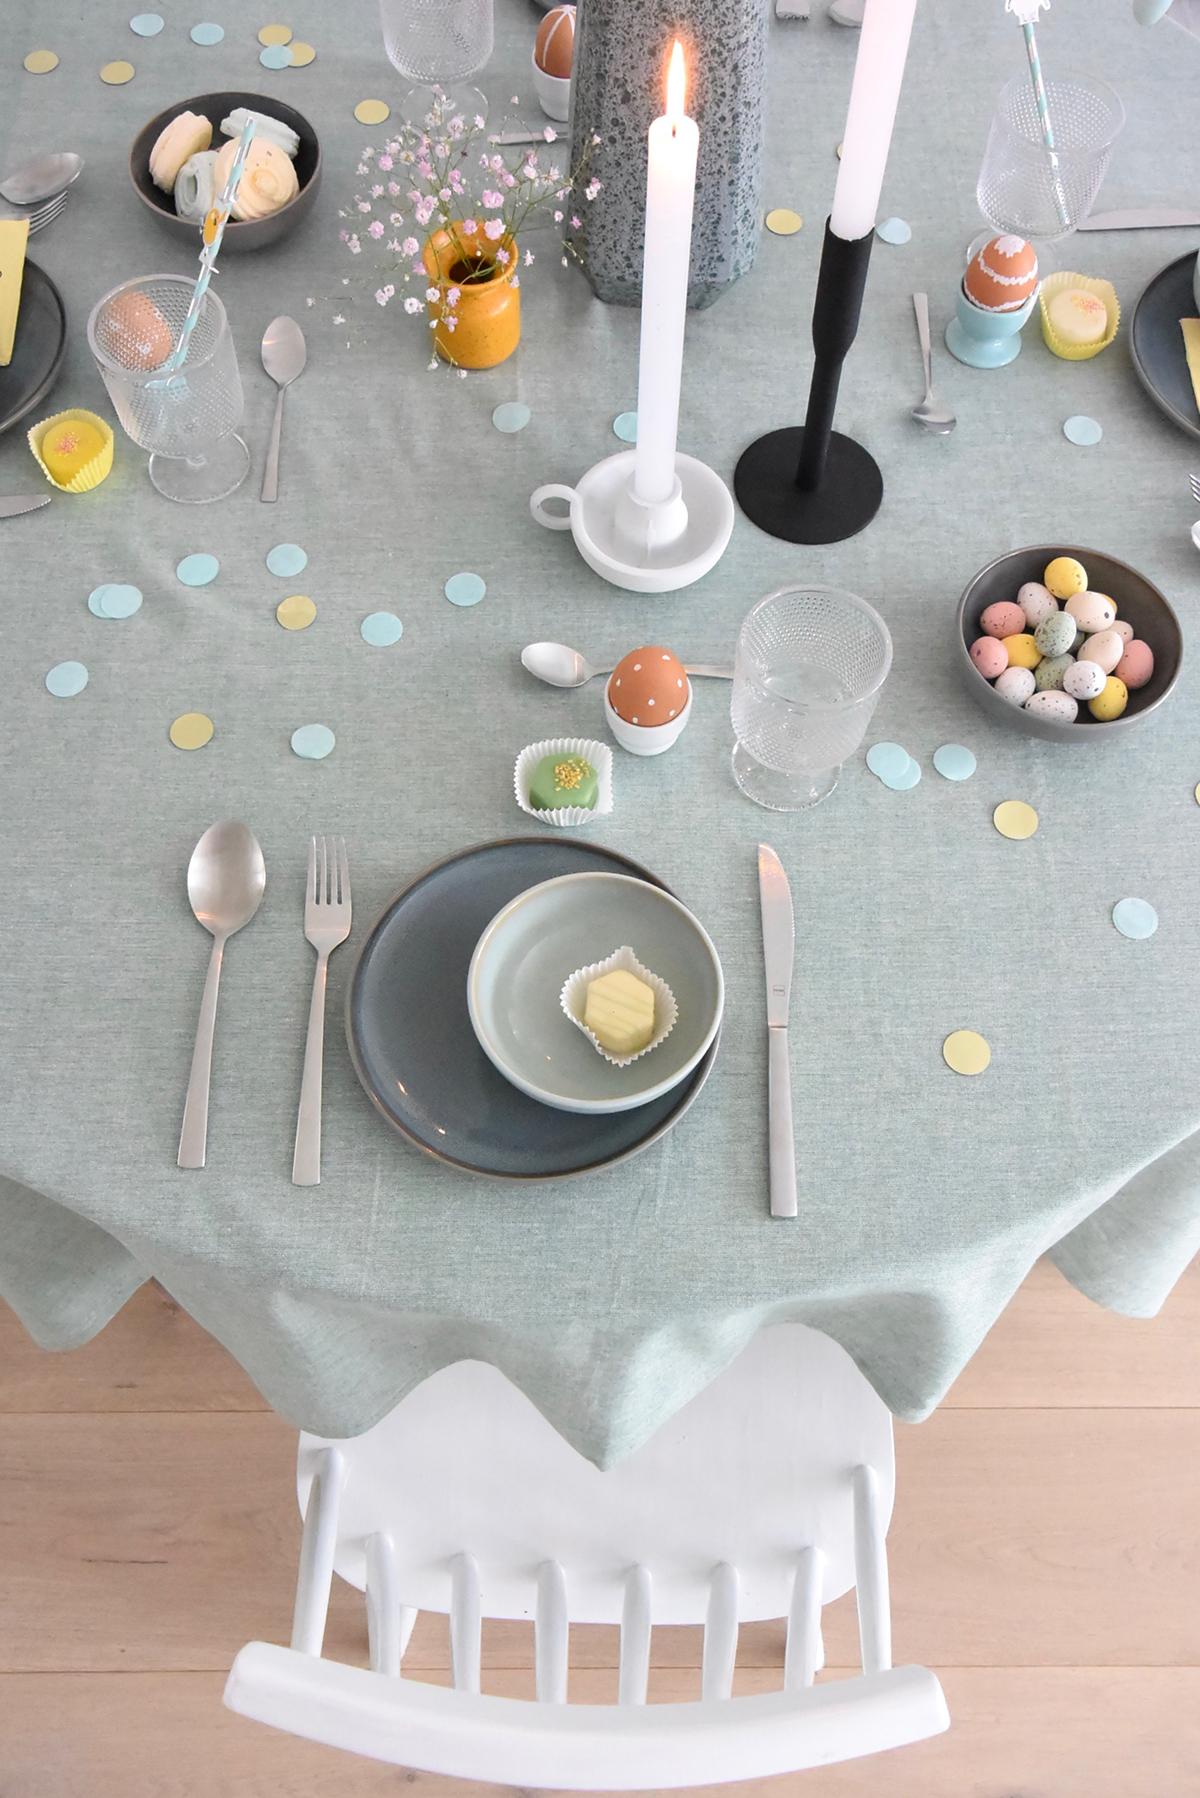 Hema-paastafel-grijs-bord-groene-kom-witte-kaarsen-confetti-paaseitjes